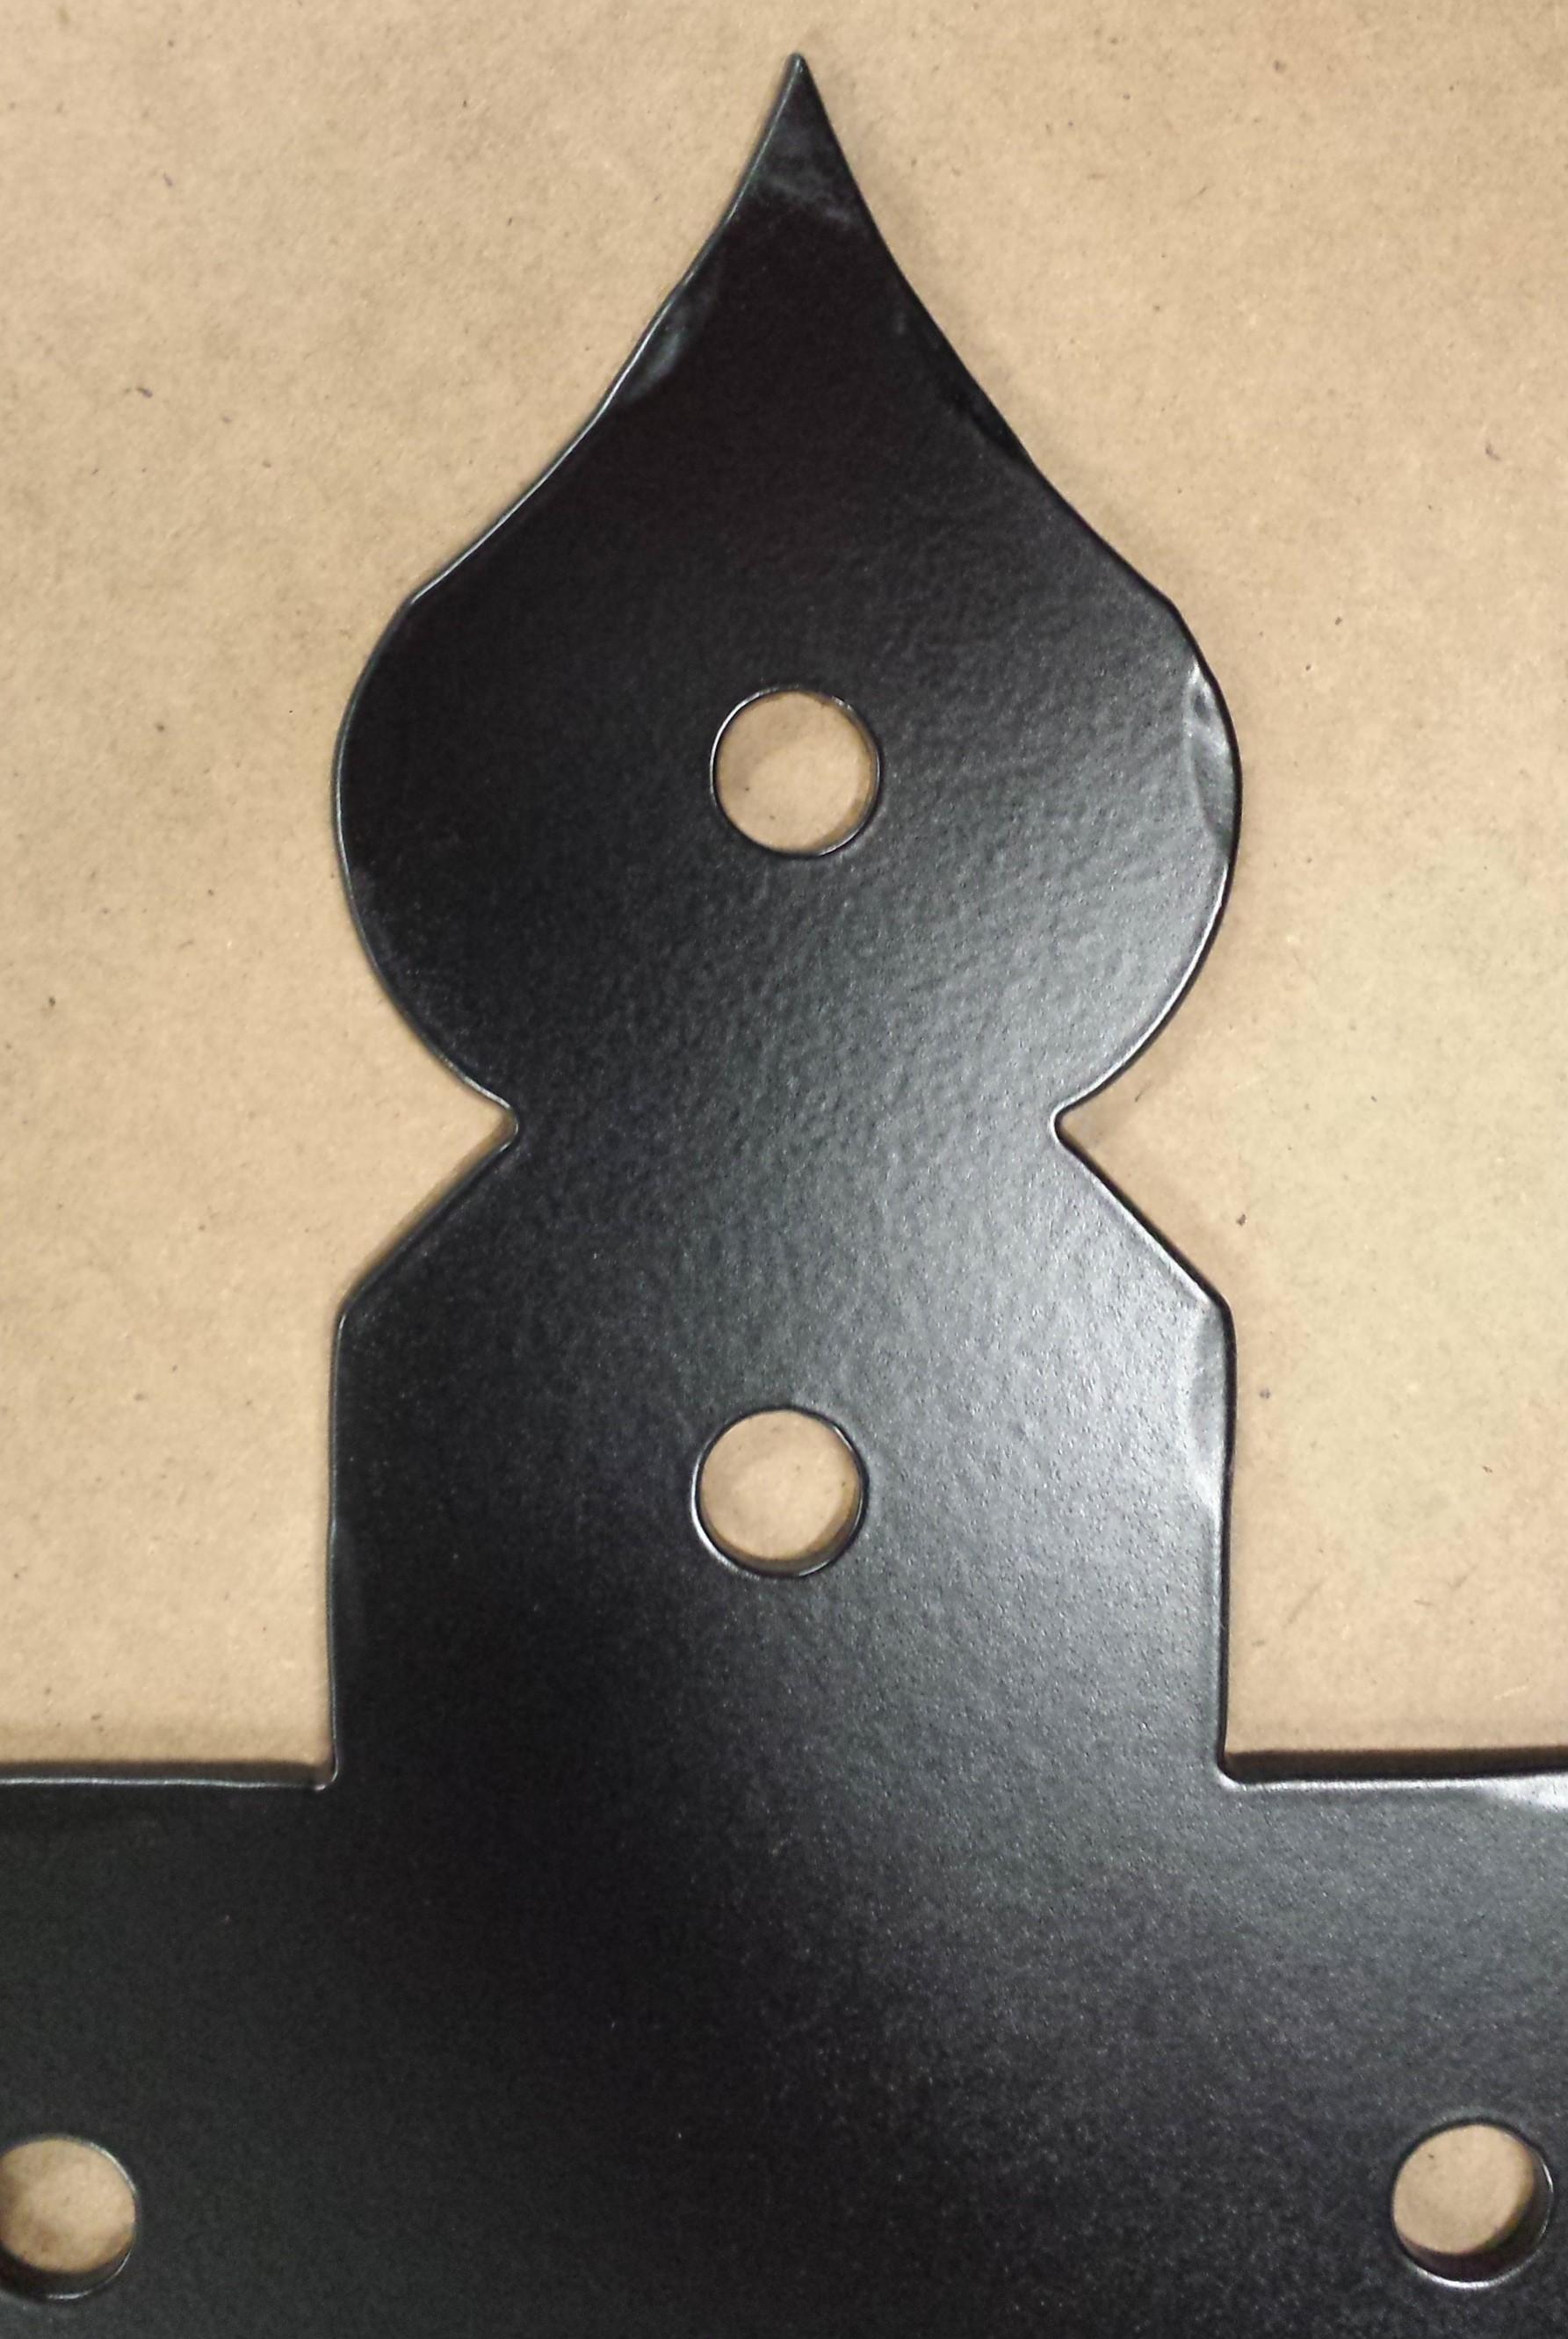 sxb-13-3.jpg